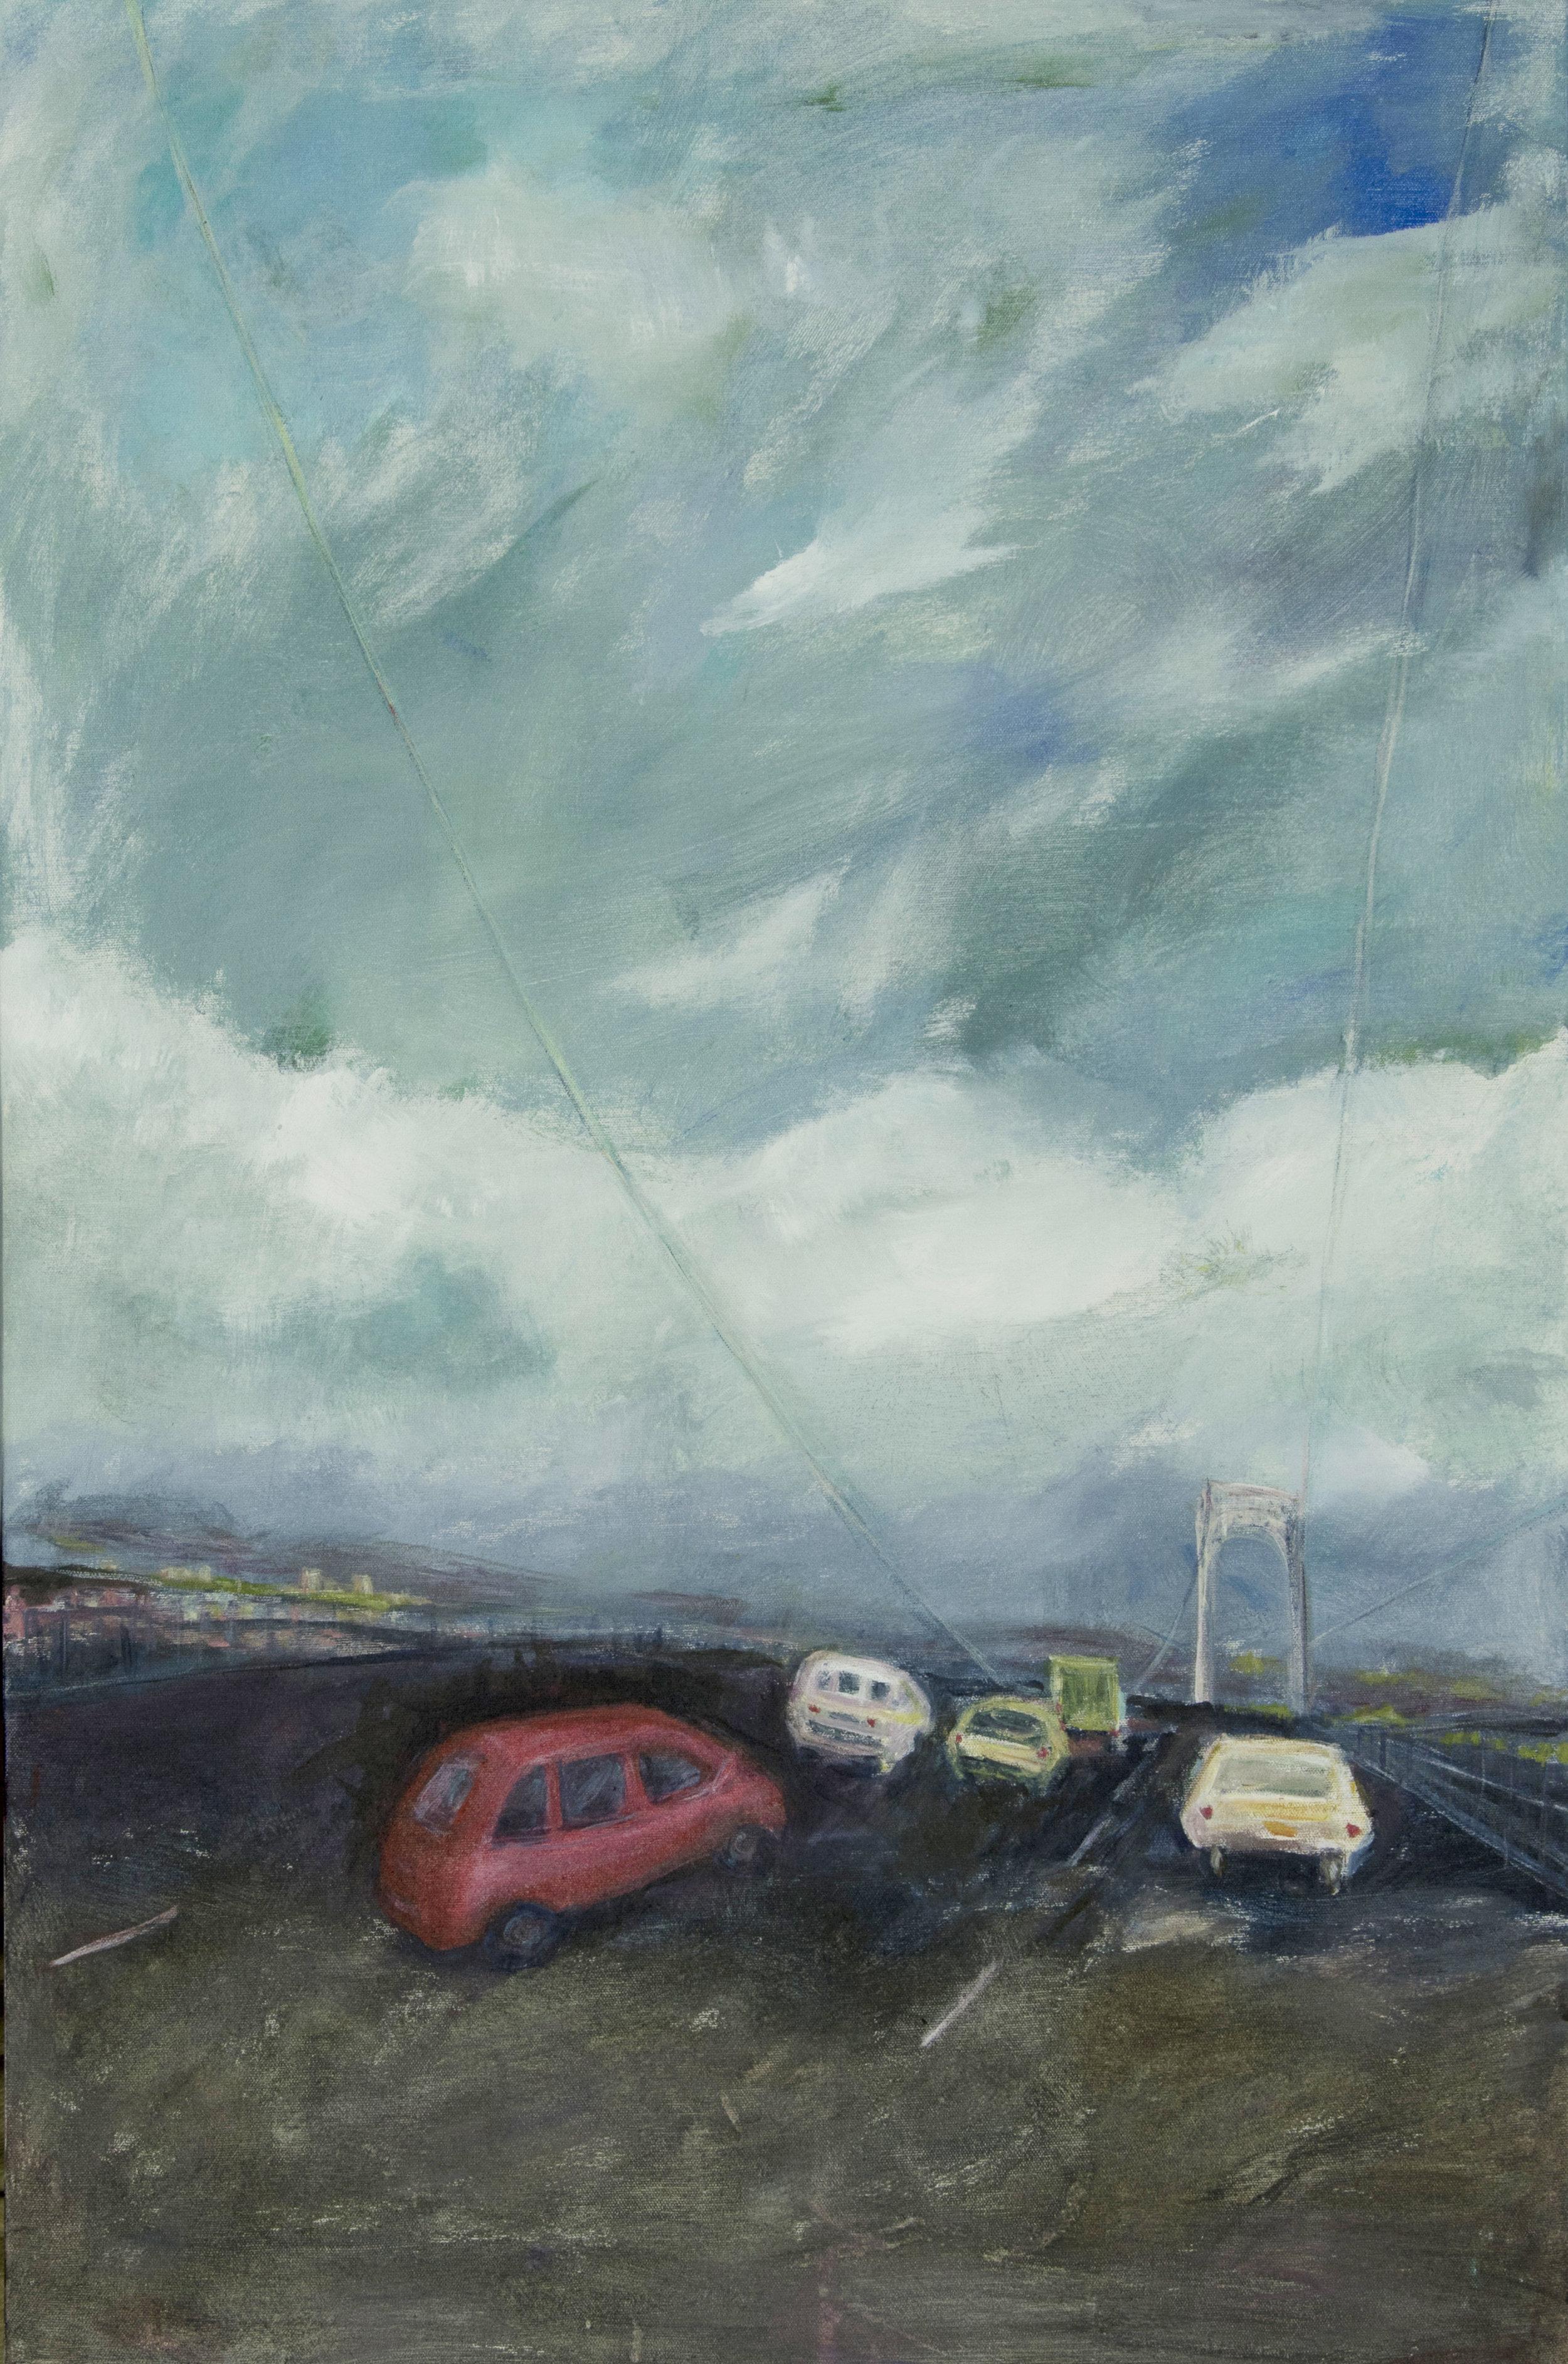 On the Bridge Acrylic on canvas 24x 36